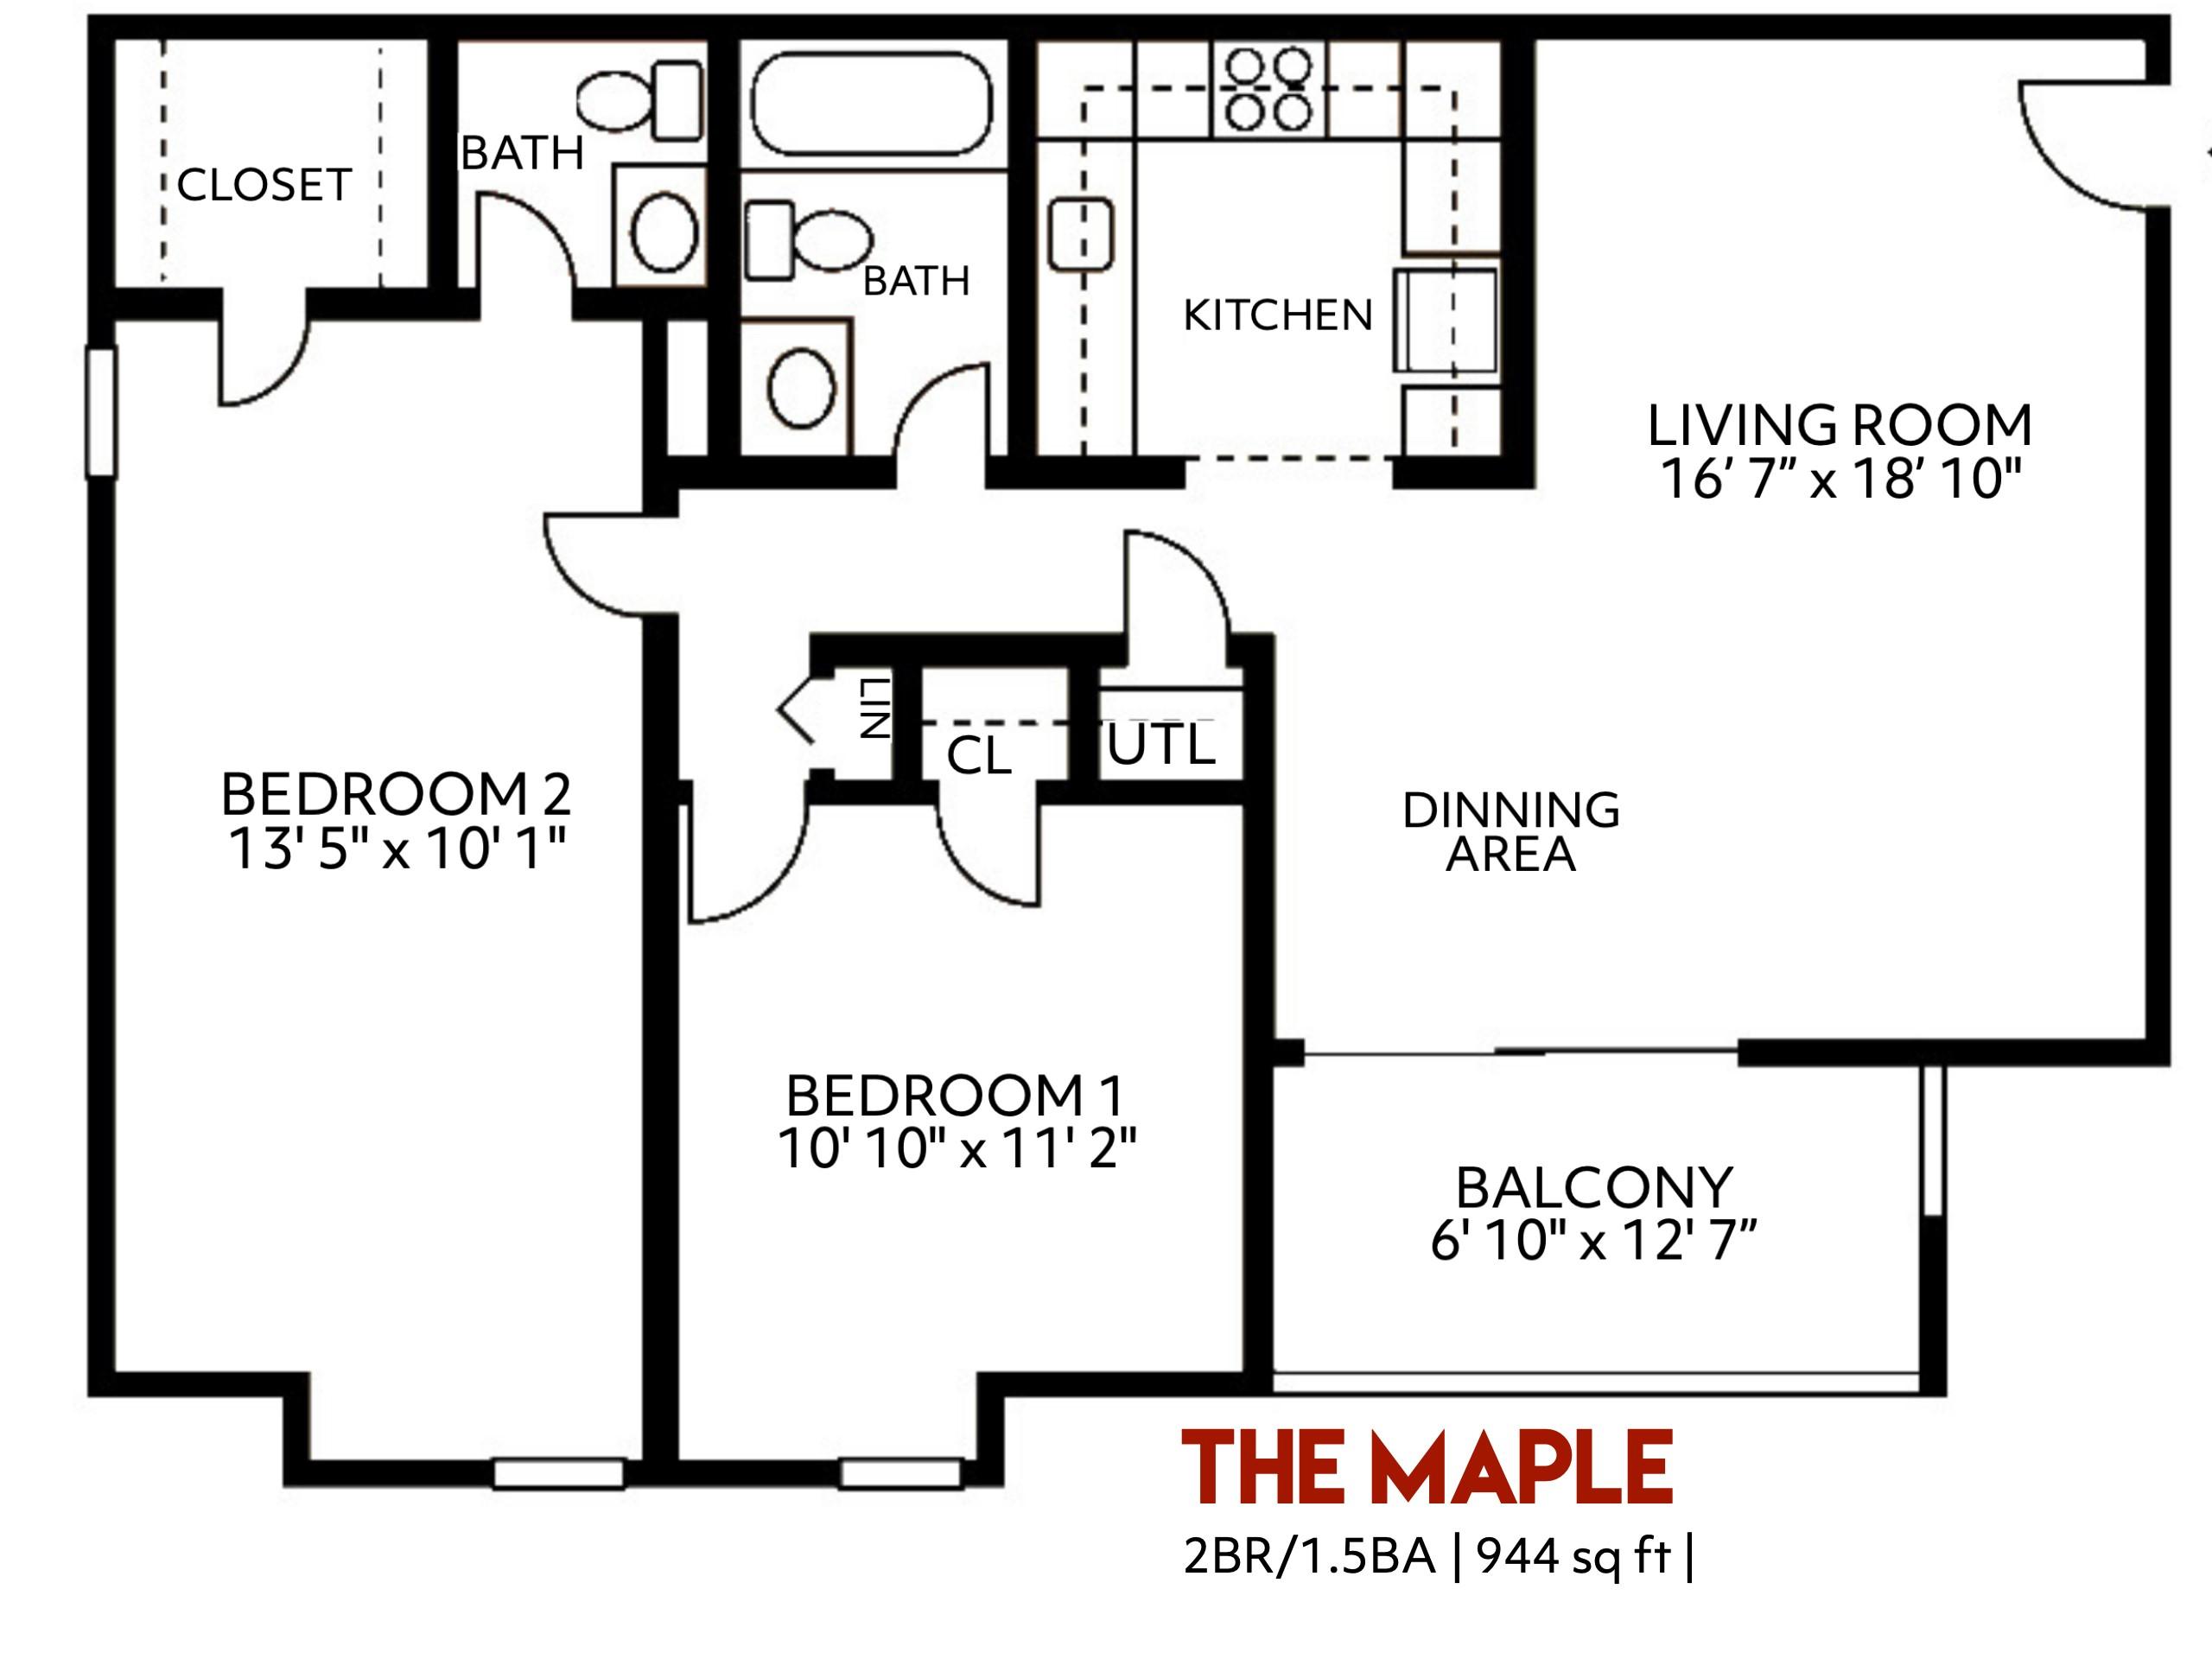 The Maple Floorplan